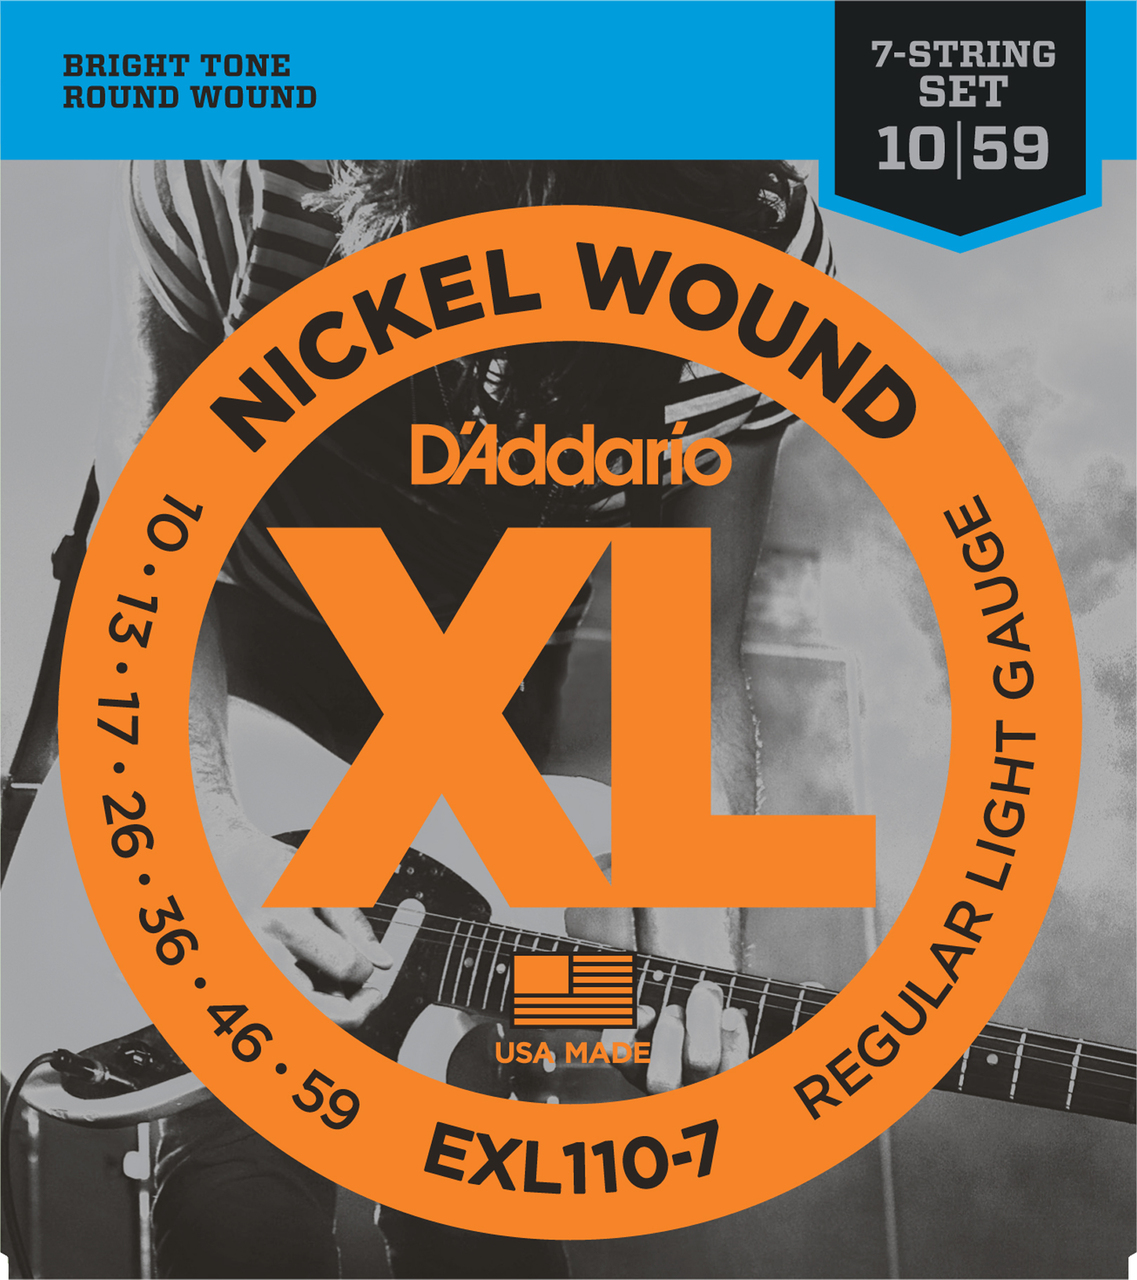 D'addario EXL110-7 Regular Light Seven String Electric Guitar Strings